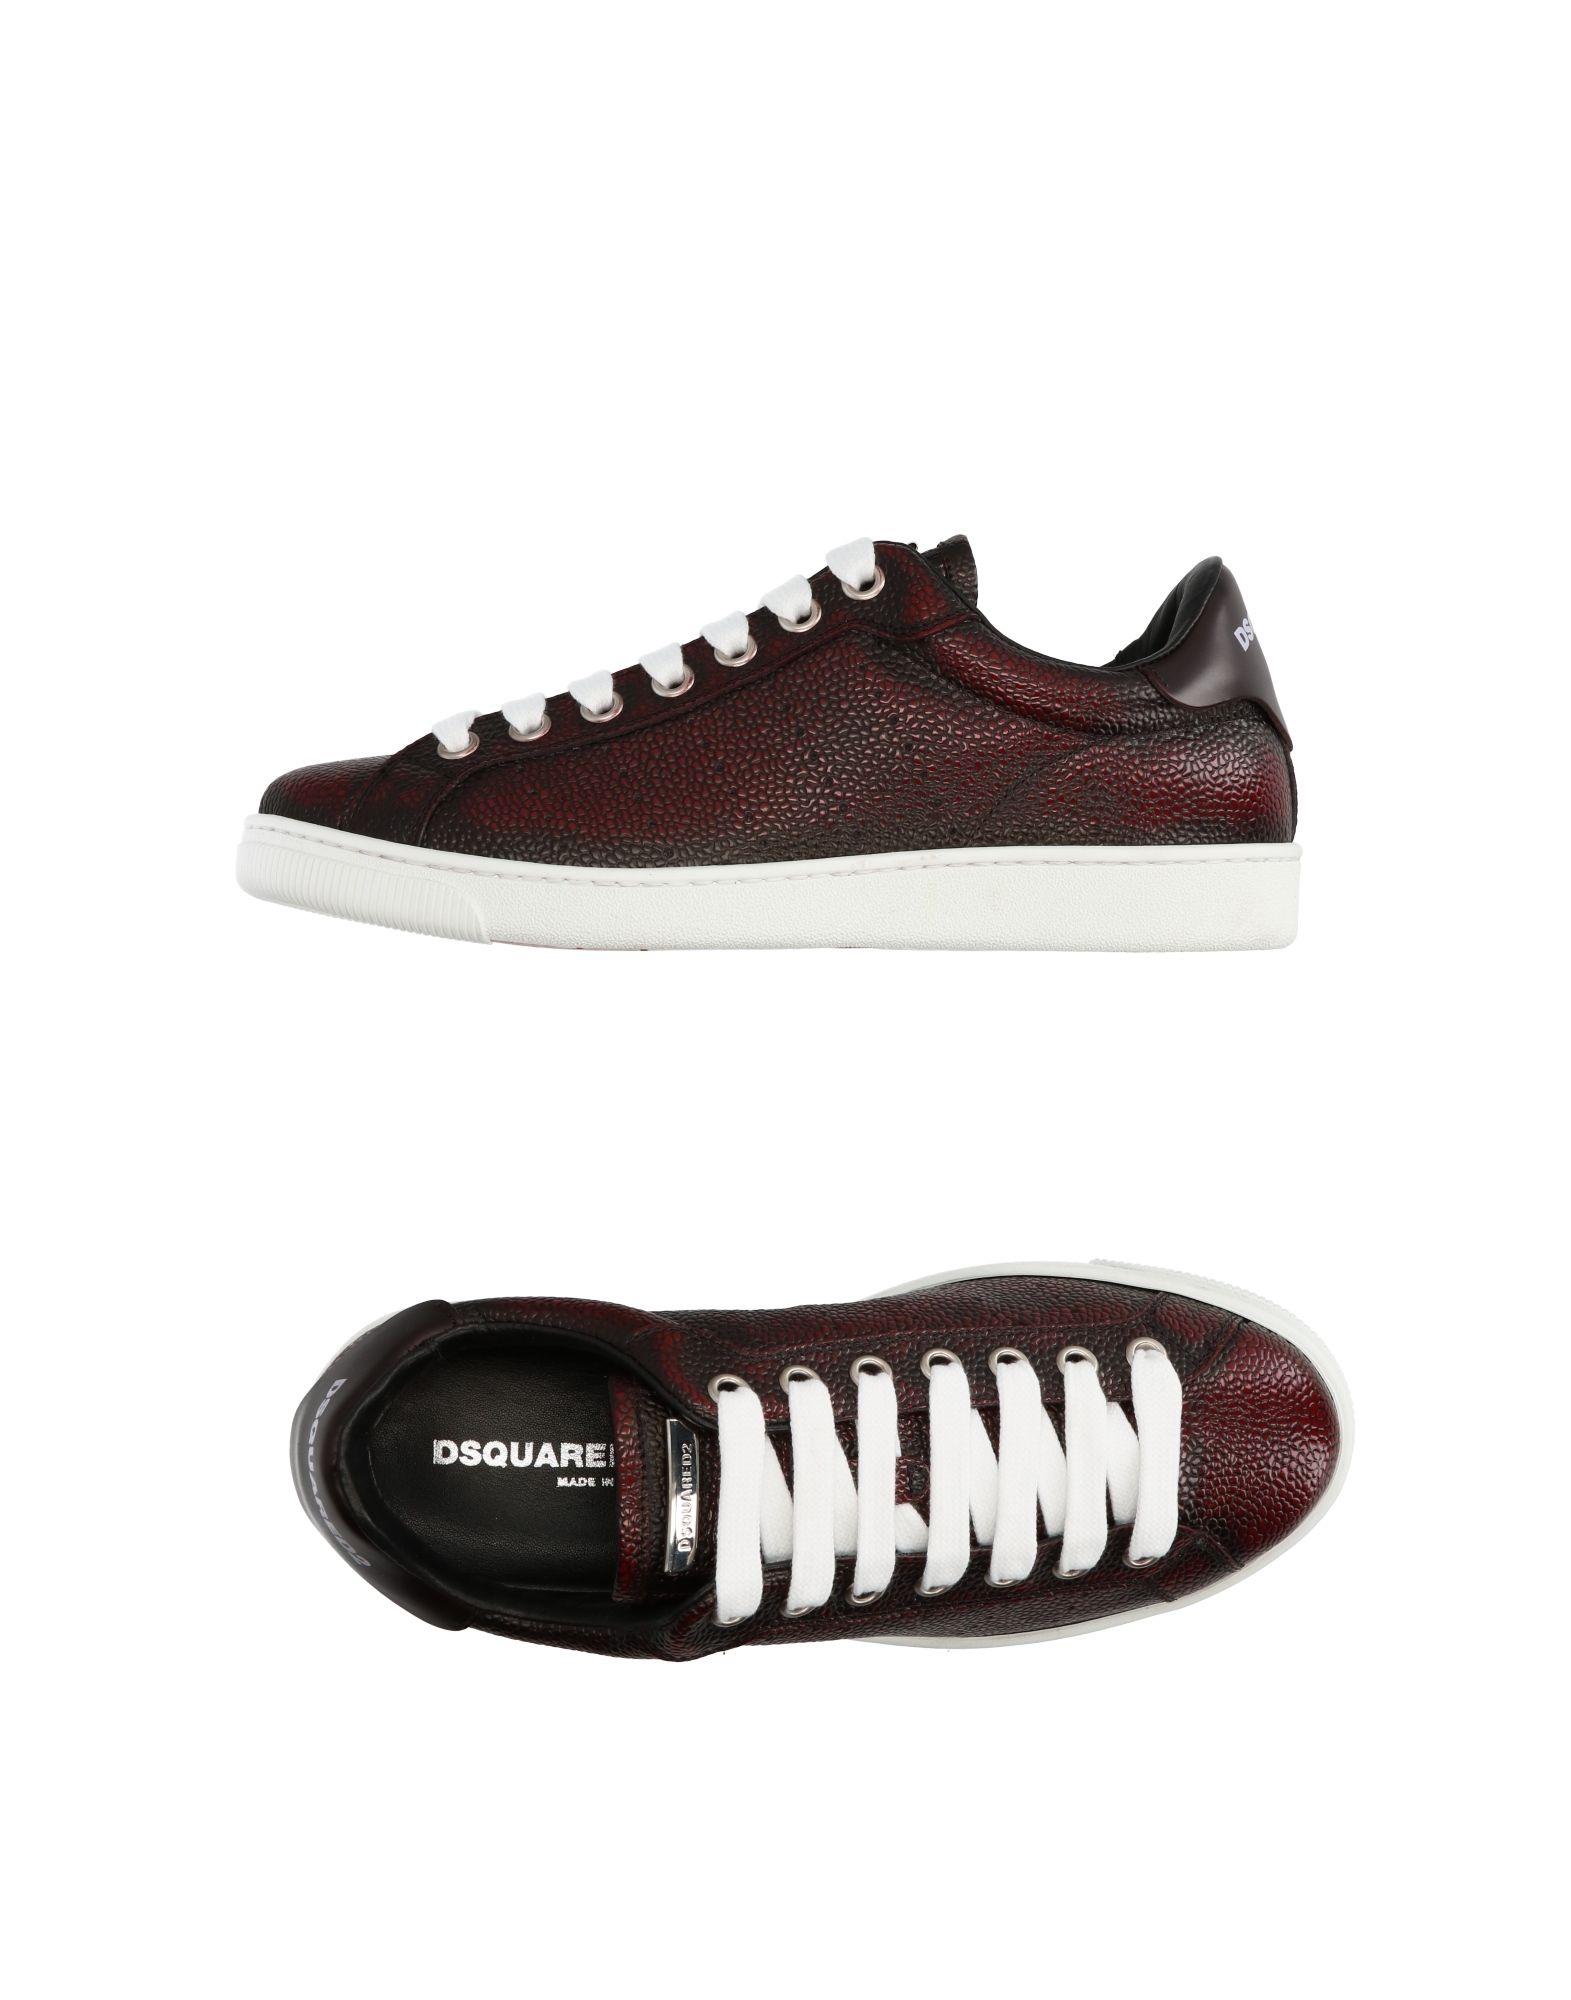 Dsquared2 Sneakers Herren  11243329FC Gute Qualität beliebte Schuhe